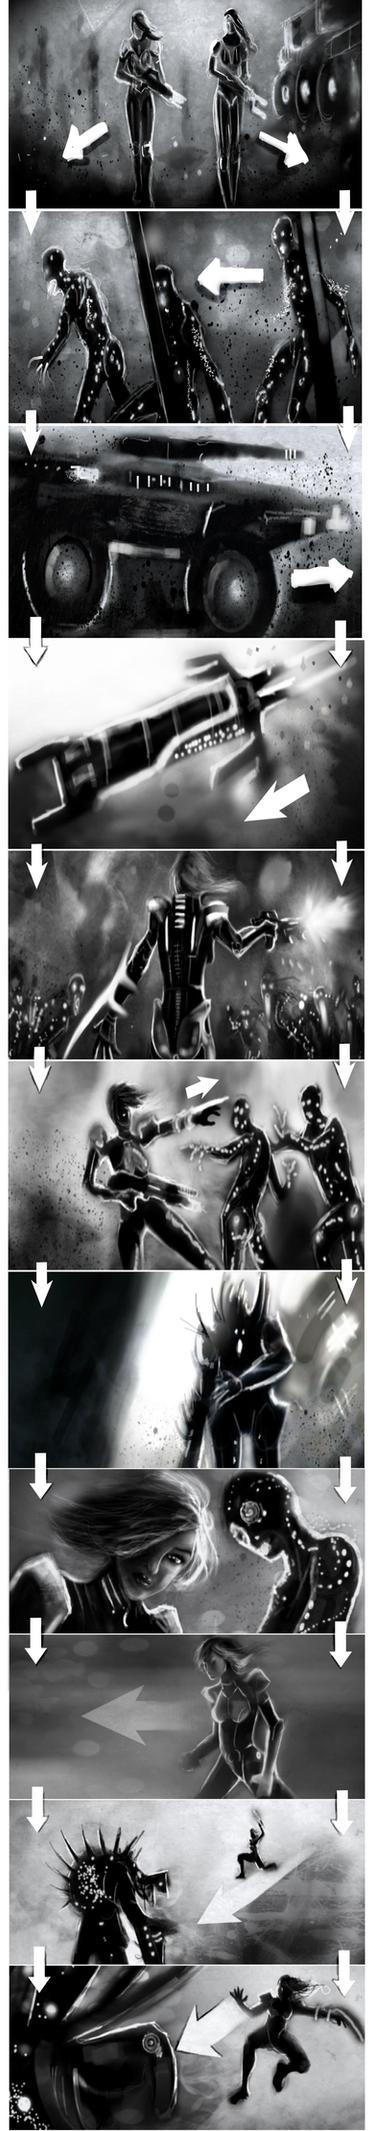 Mass Effect  Storyboard by SeanNash